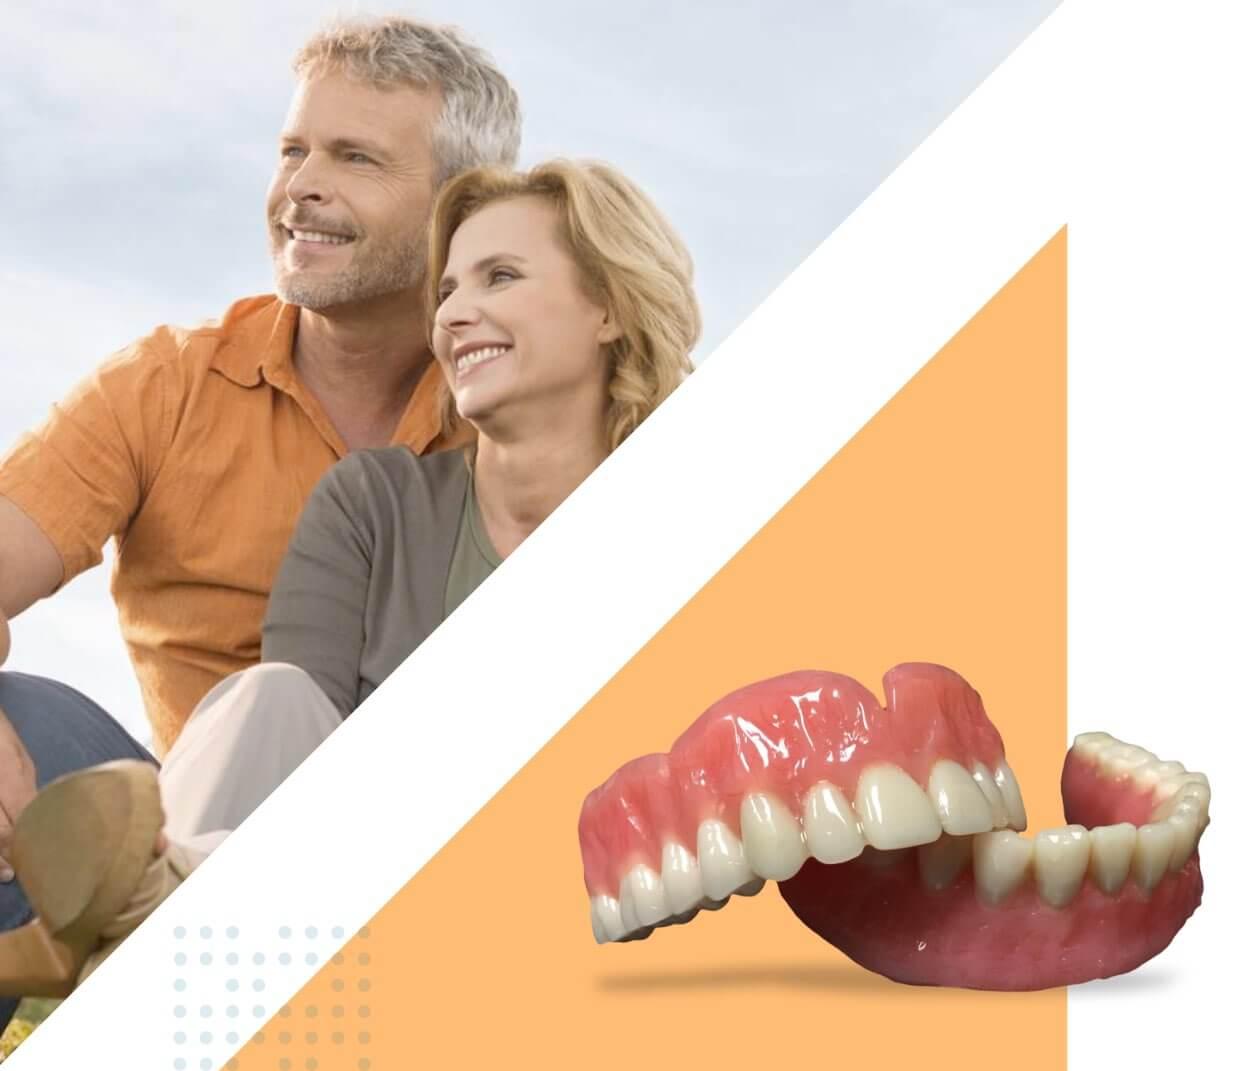 Basic Denture